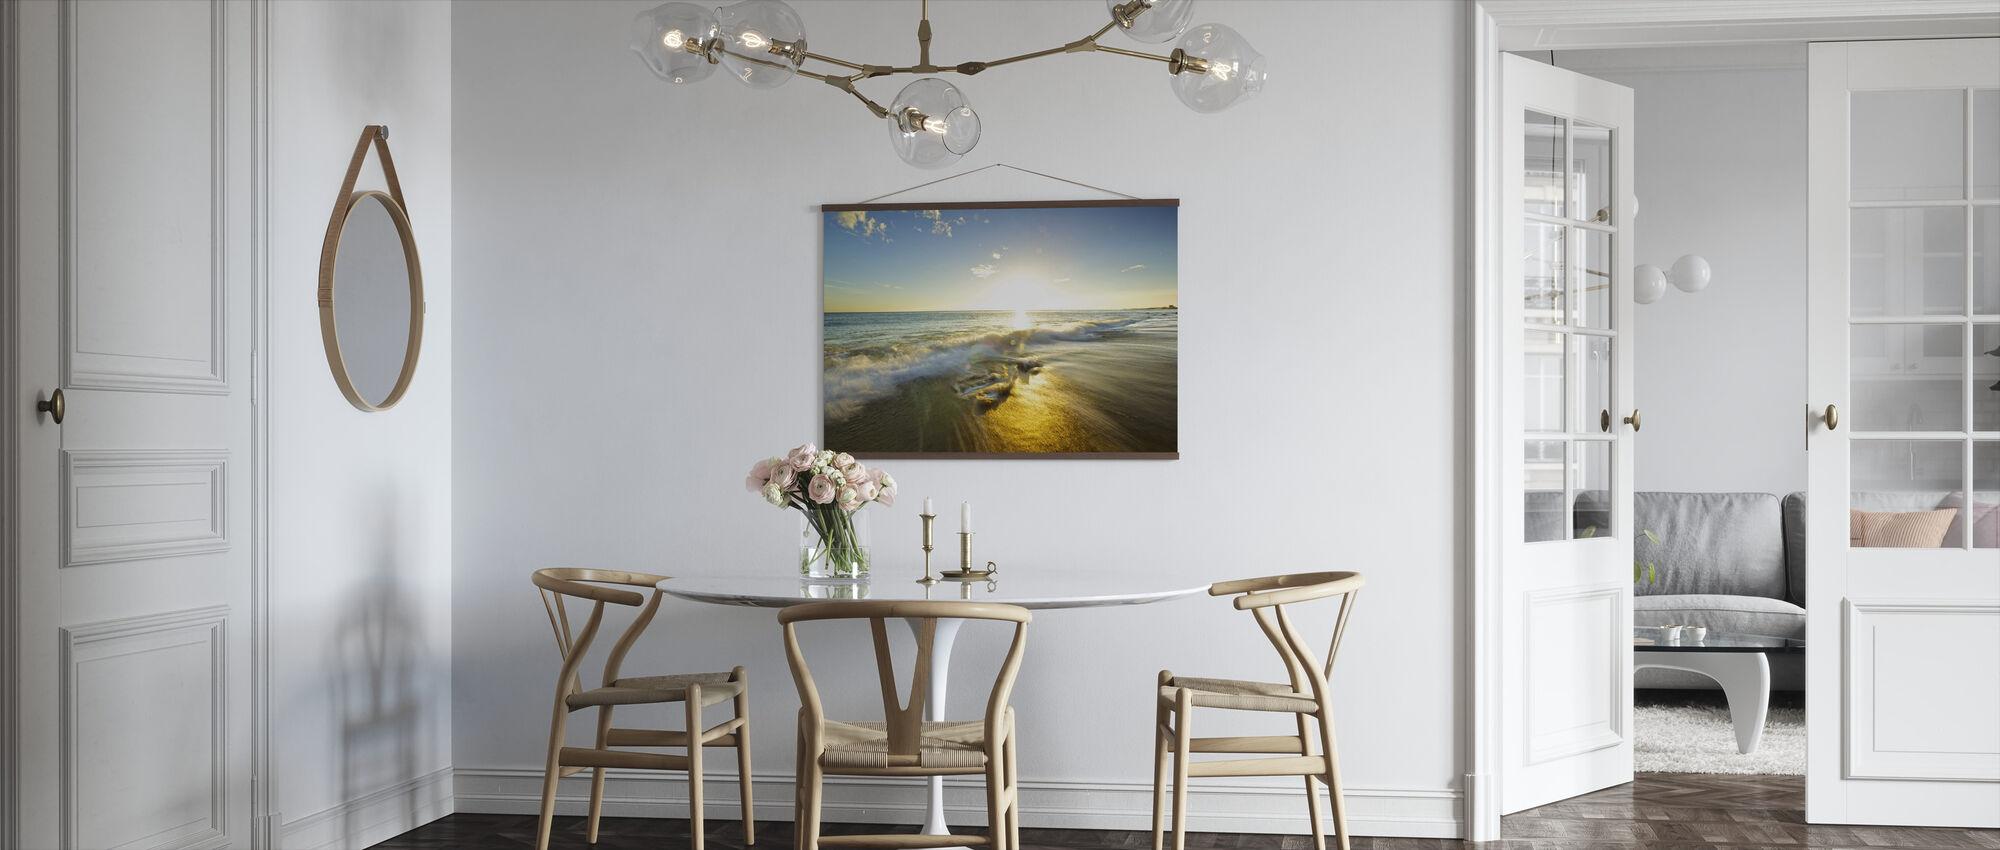 Gouden Middag in Fangsheng - Poster - Keuken